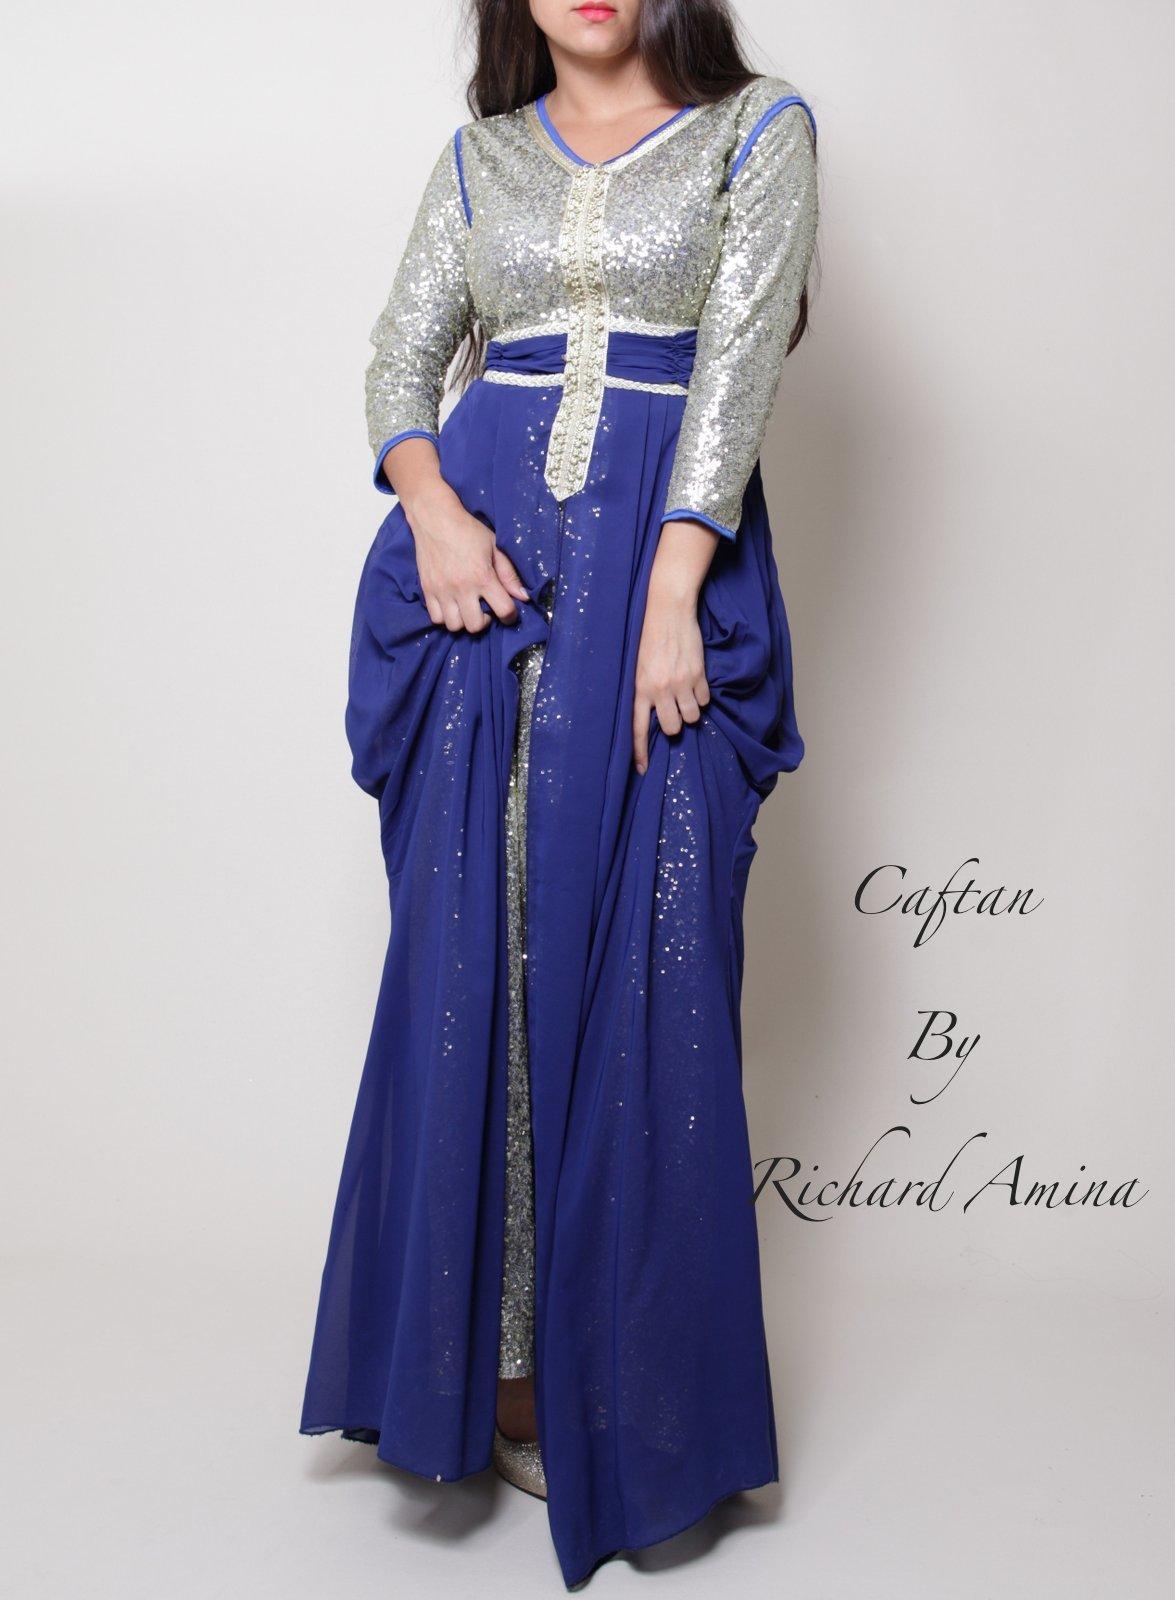 eb6c6d625f3 Robe caftan Dubaï à louer - Bleu   Argent - Caftan by richard Amina